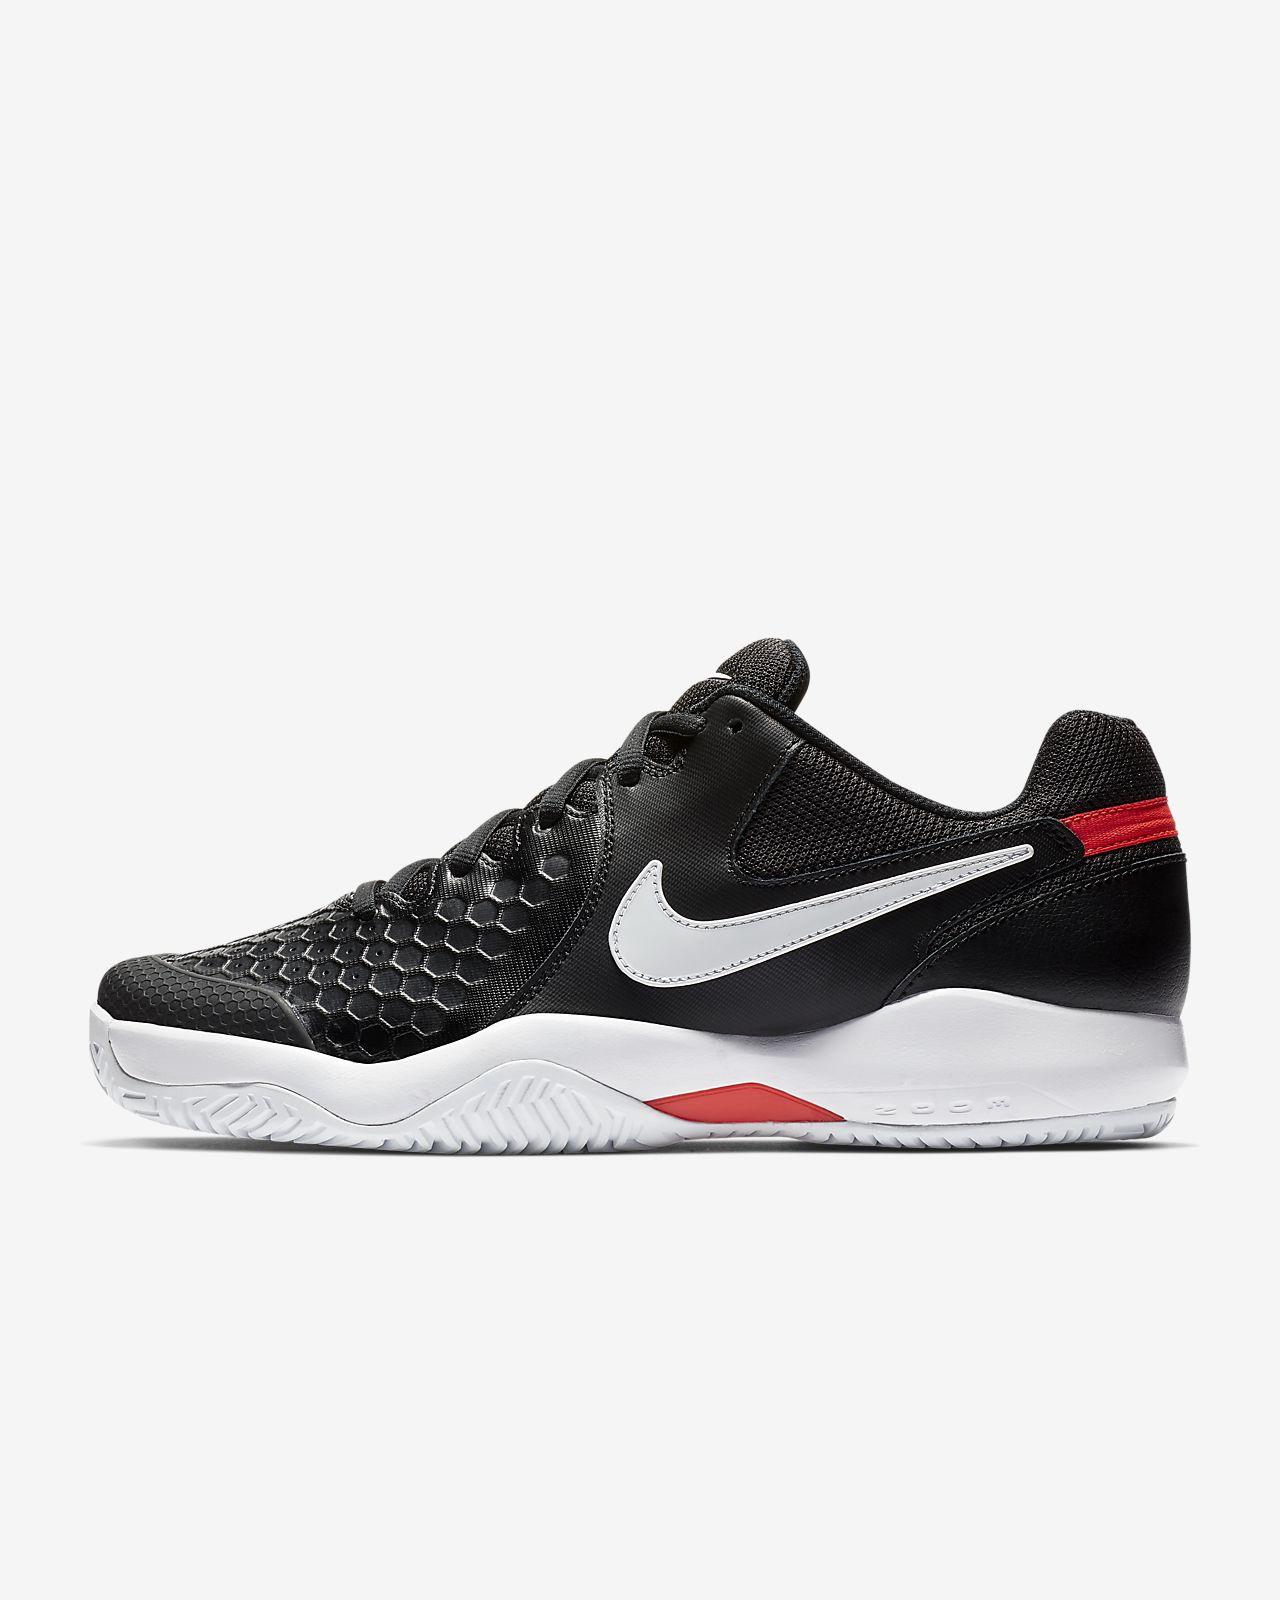 9e42fe9dfc NikeCourt Air Zoom Resistance Men's Hard Court Tennis Shoe. Nike.com GB